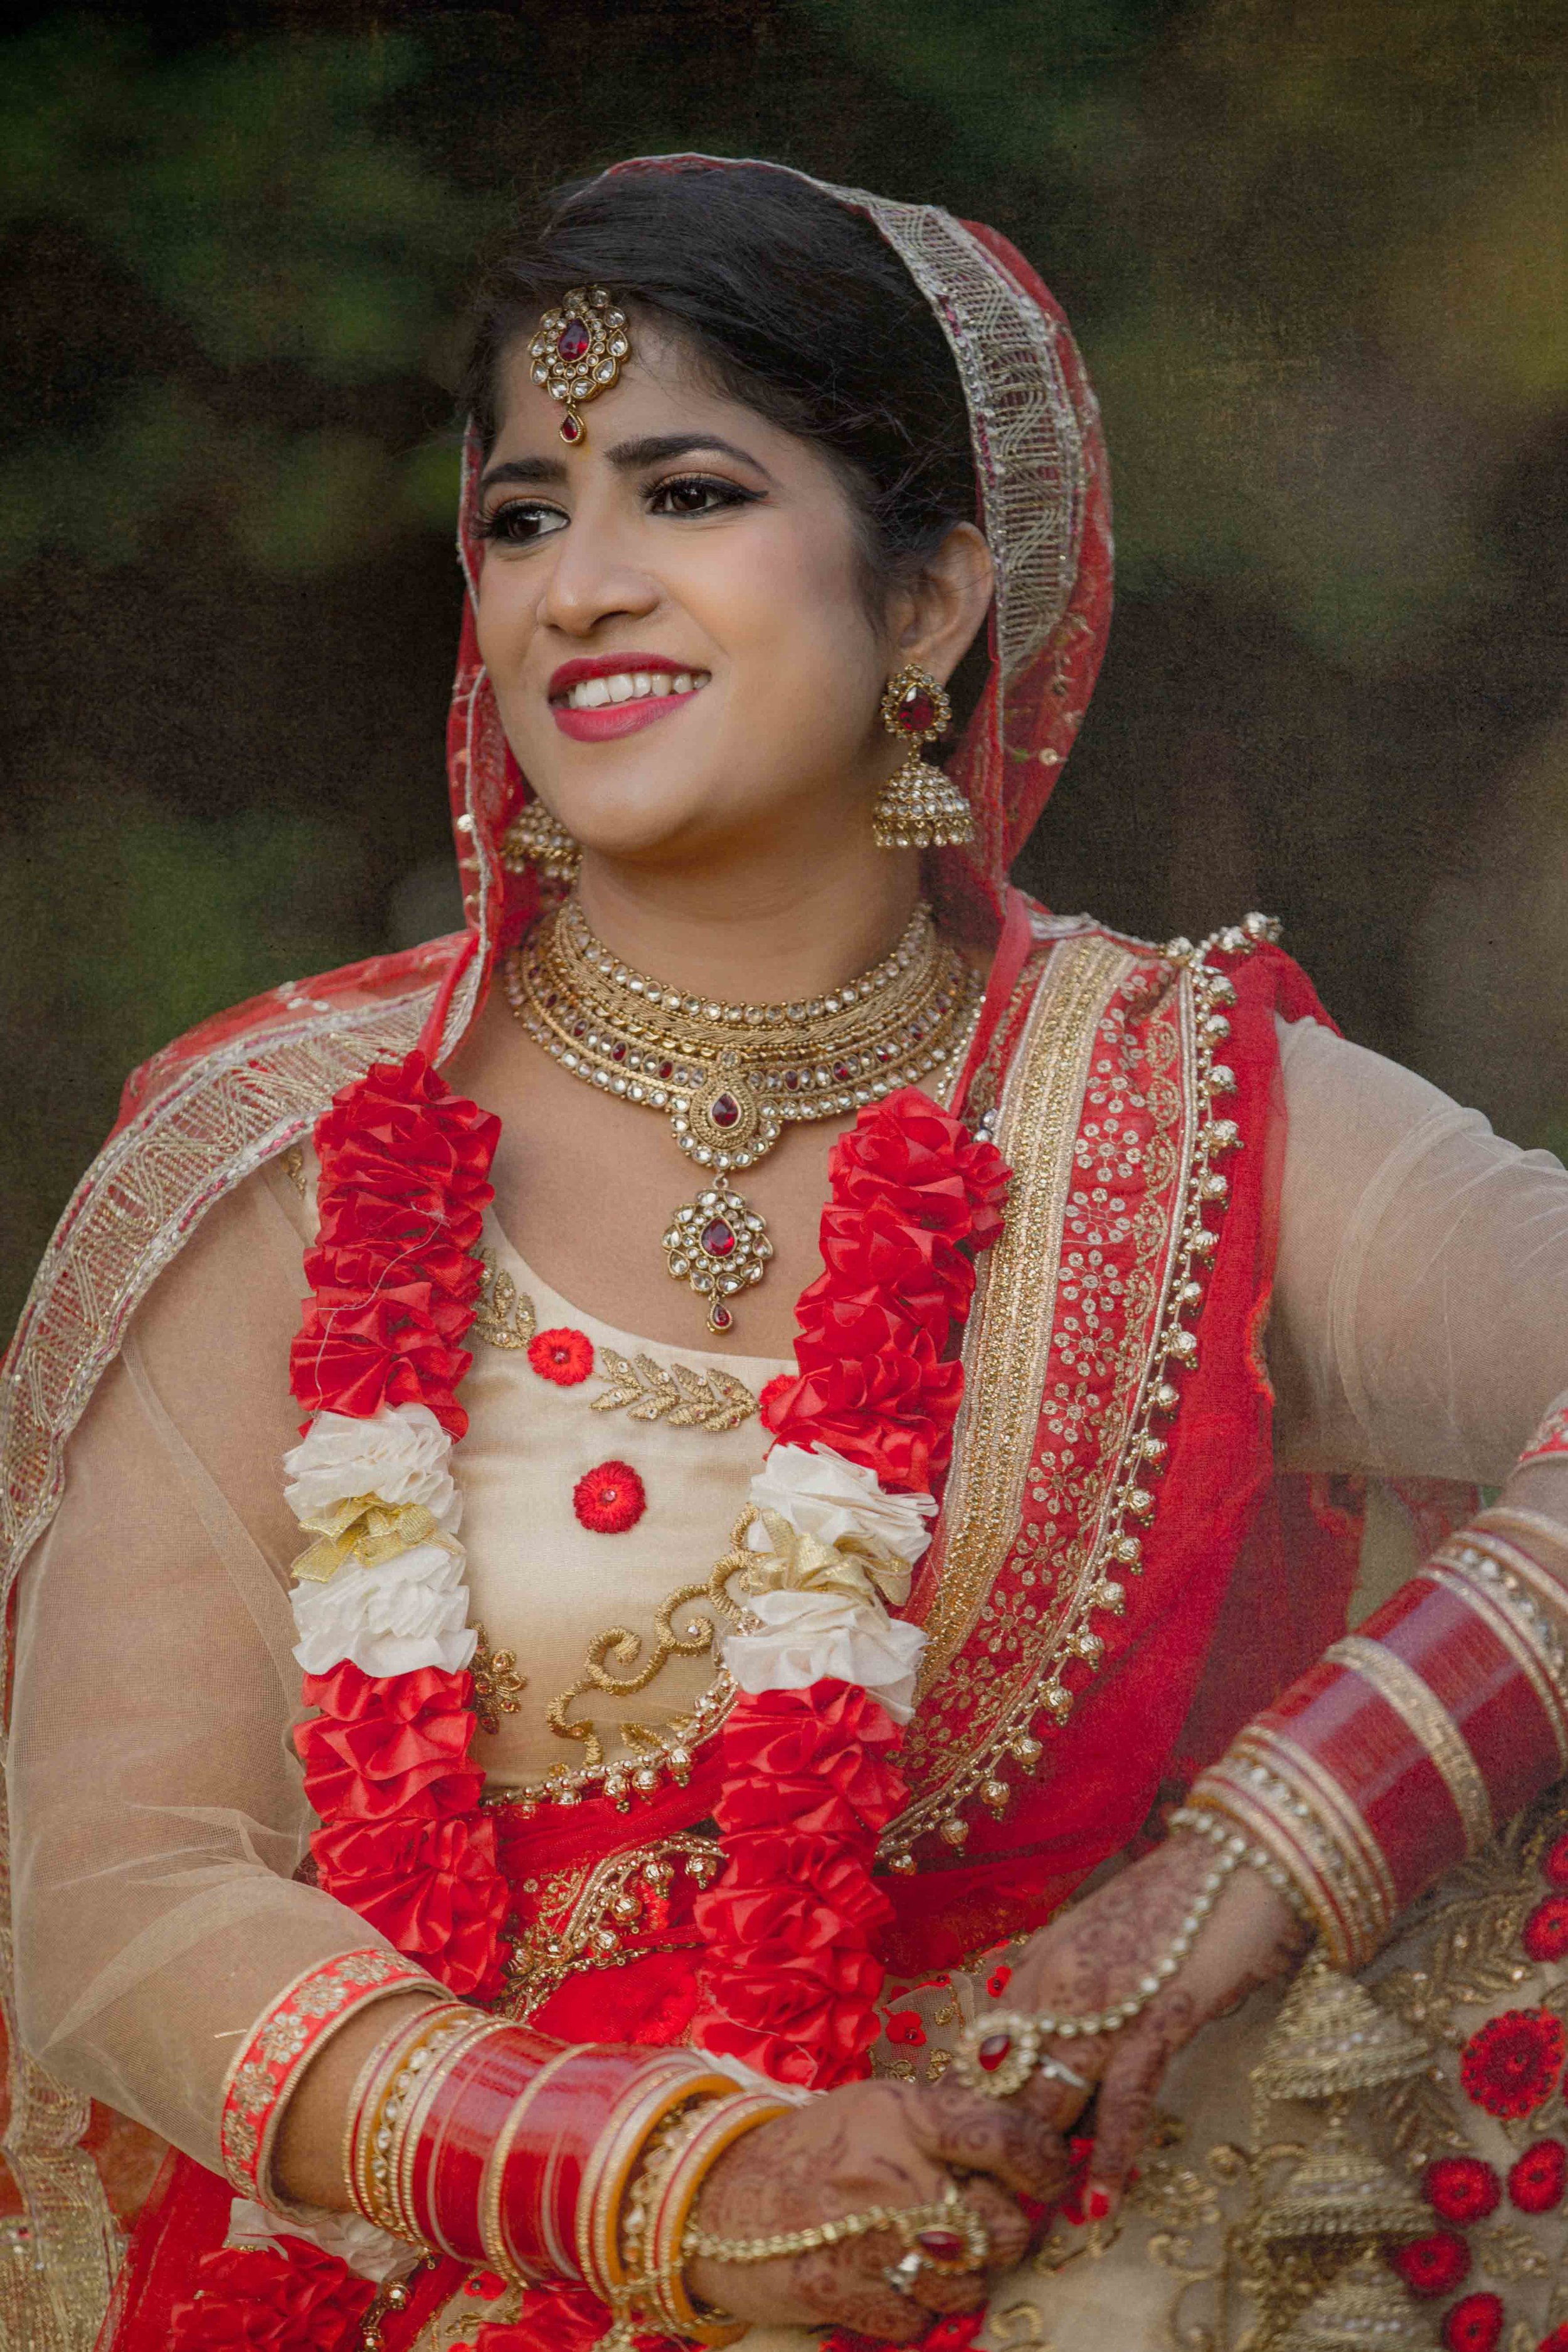 ramada-park-hall-hotel-birmingham-wolverhampton-hindu-wedding-asian-wedding-photography-natalia-smith-photography-37.jpg